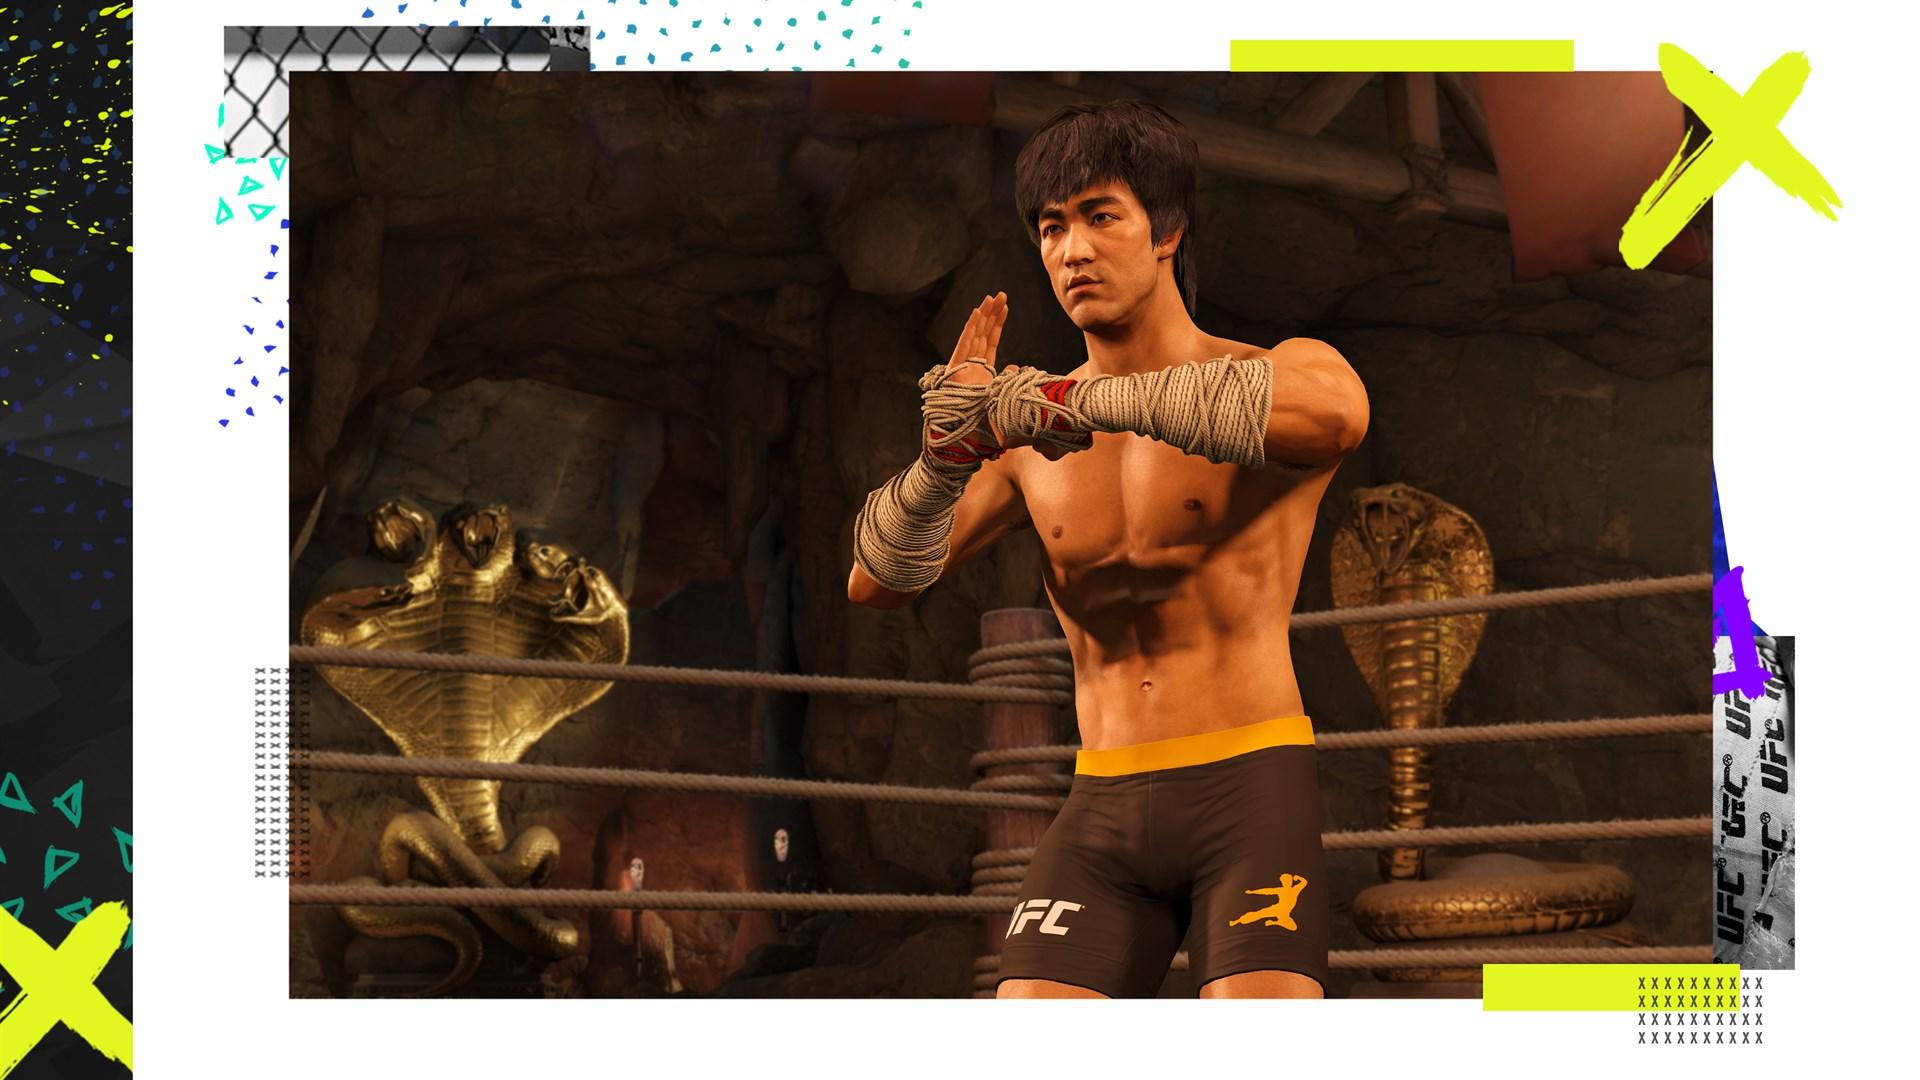 UFC® 4 - Bruce Lee poids welters